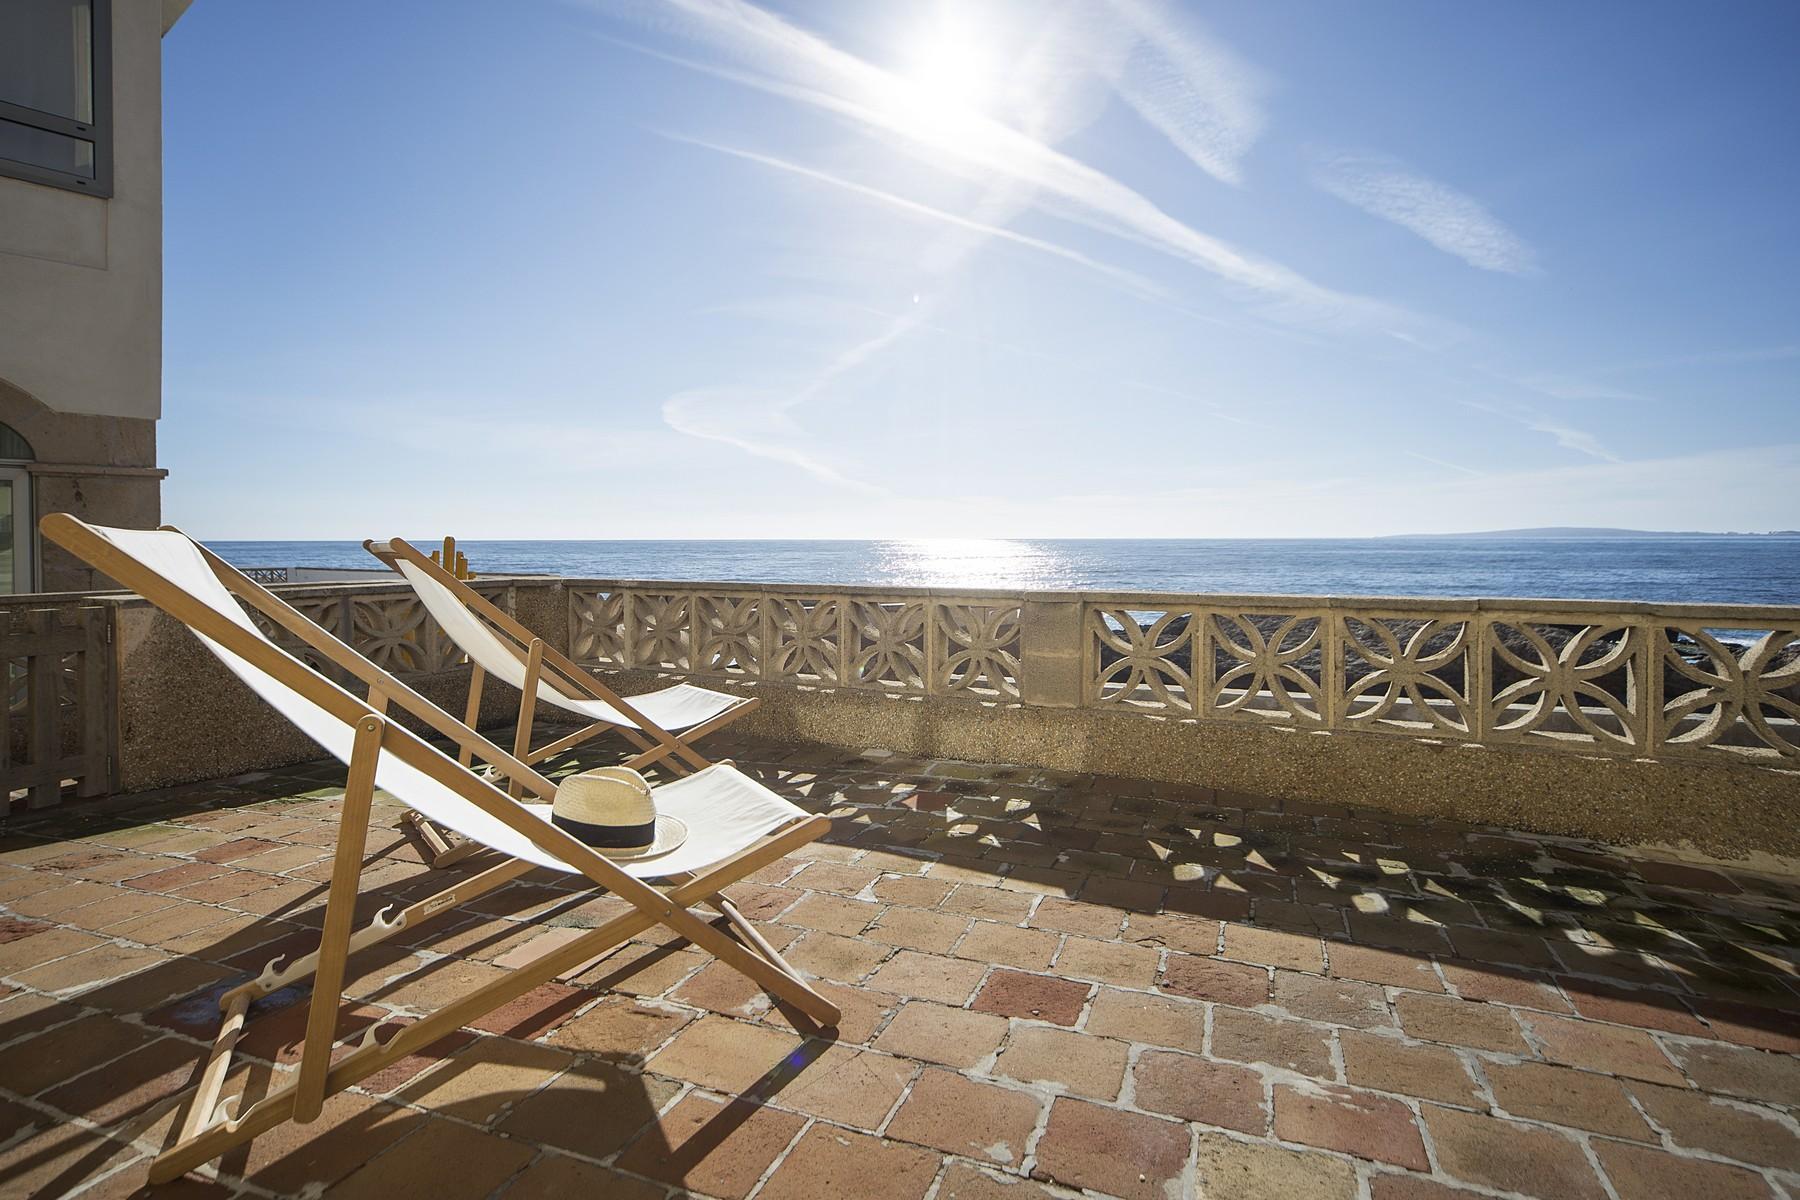 Частный односемейный дом для того Продажа на Seafront apartment in Cala Gamba with views Other Balearic Islands, Balearic Islands, 07007 Испания